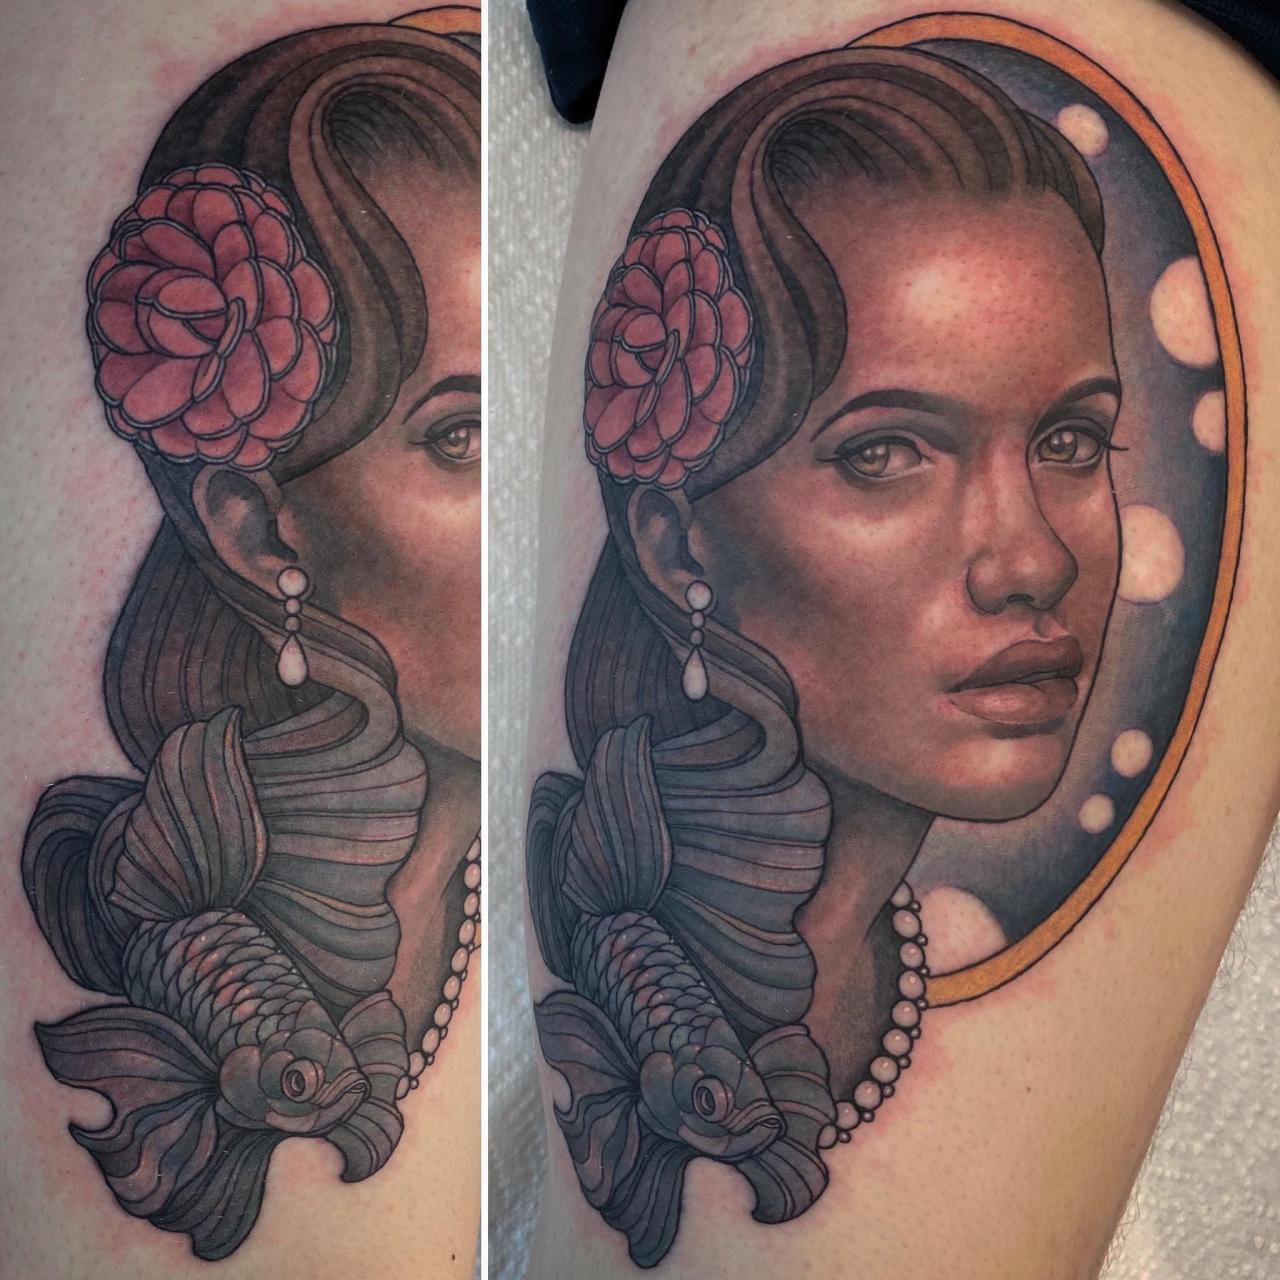 Neotraditional betta lady face by me Logan Bramlett Bespoke Tattoo Gallery Akron Ohio